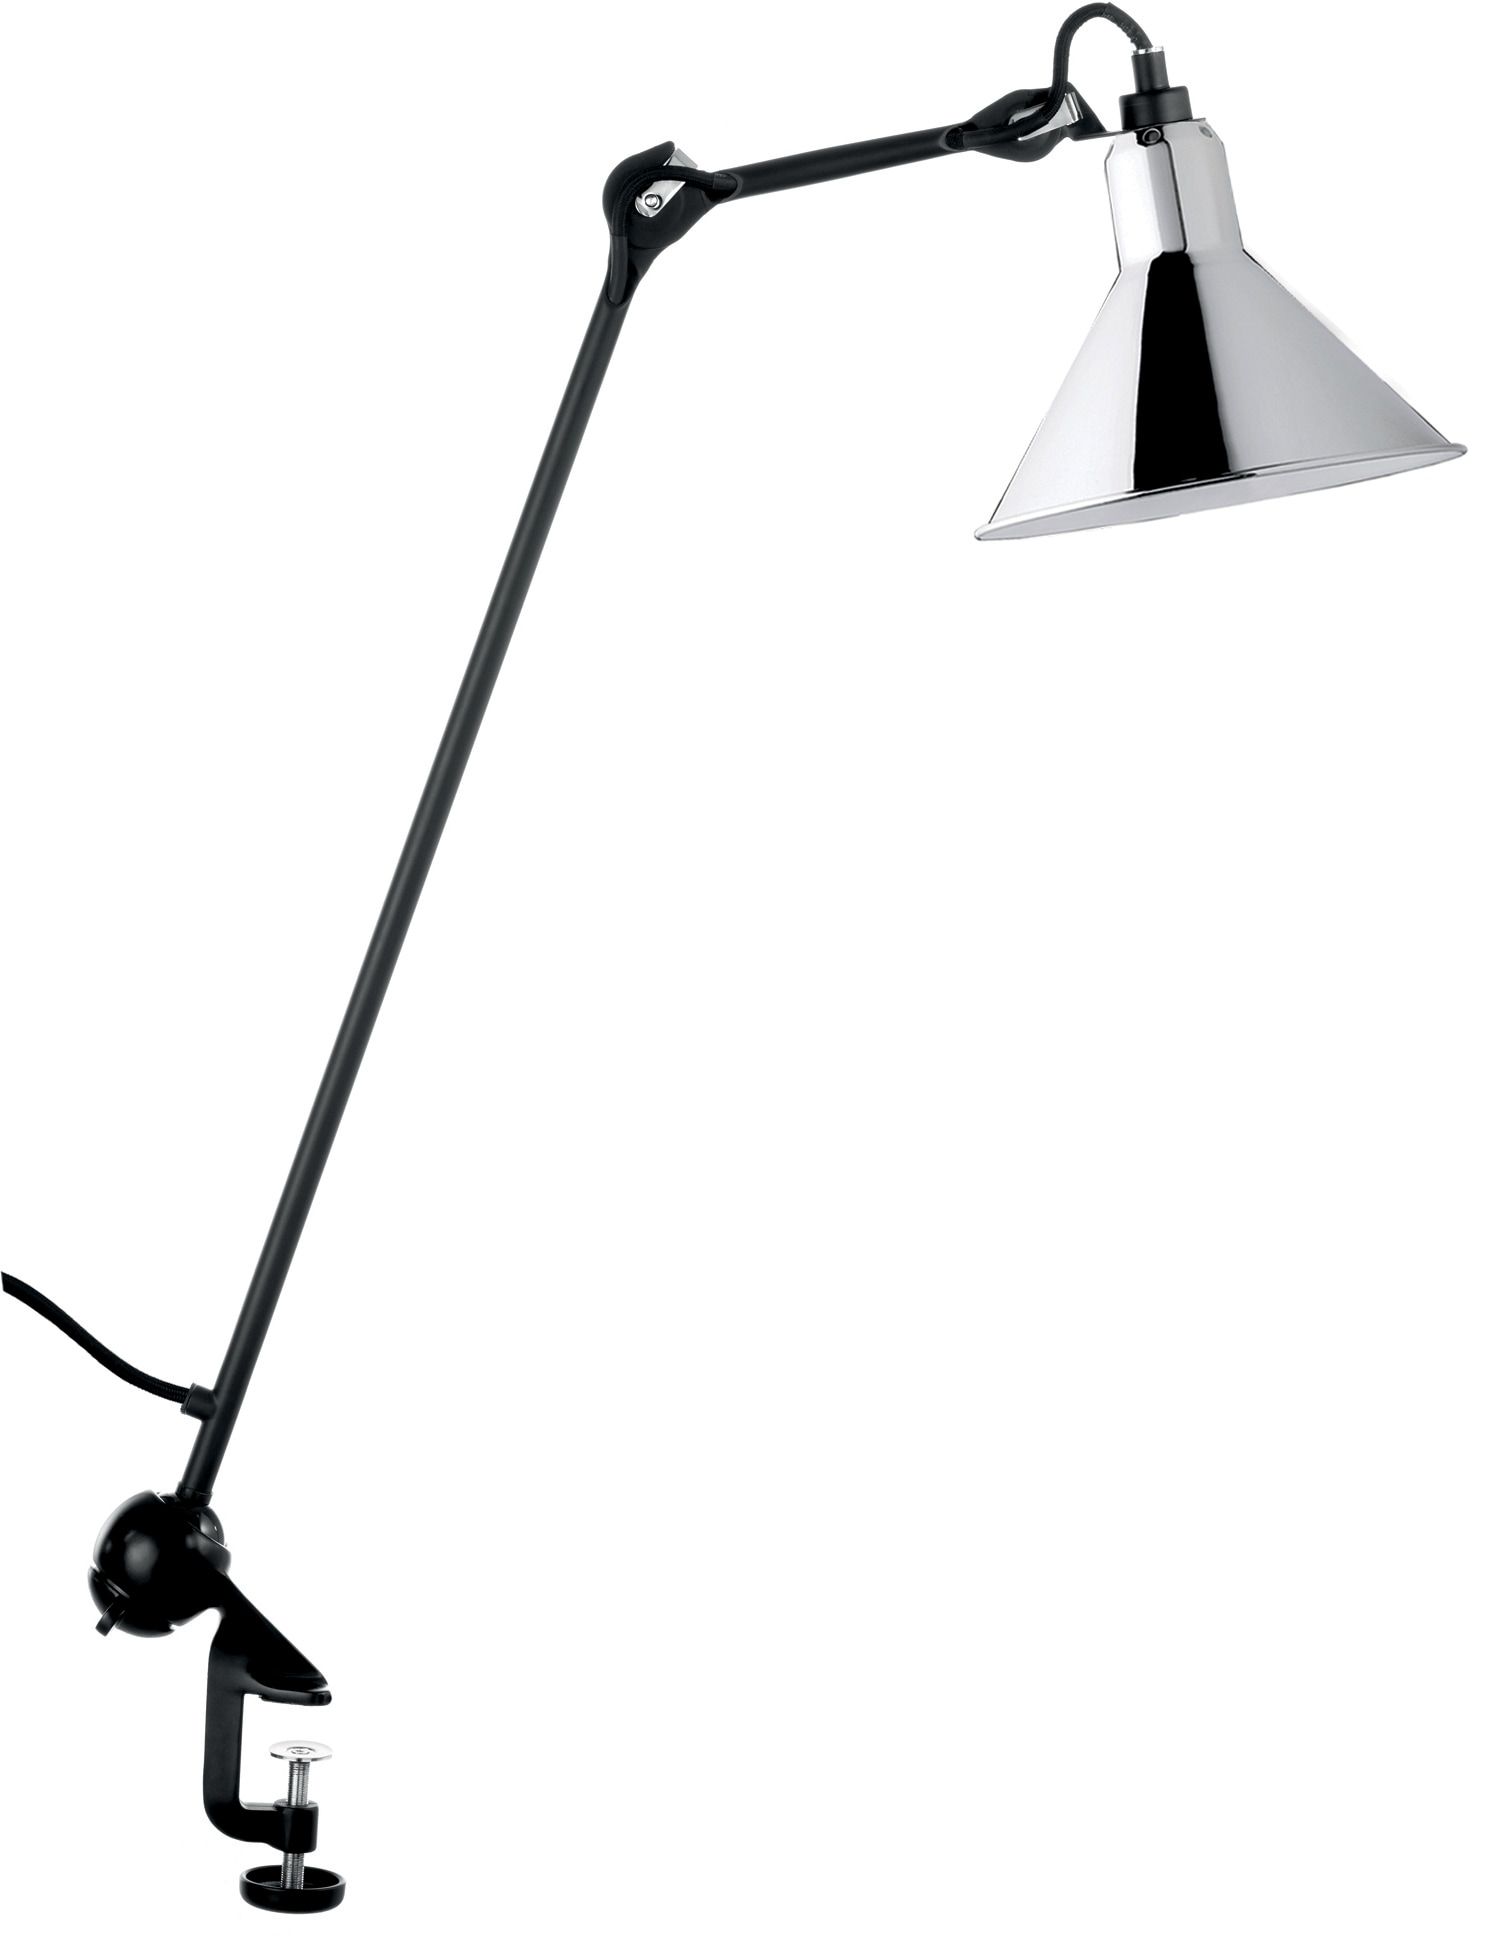 N°201 Bordslampa Krom/svart